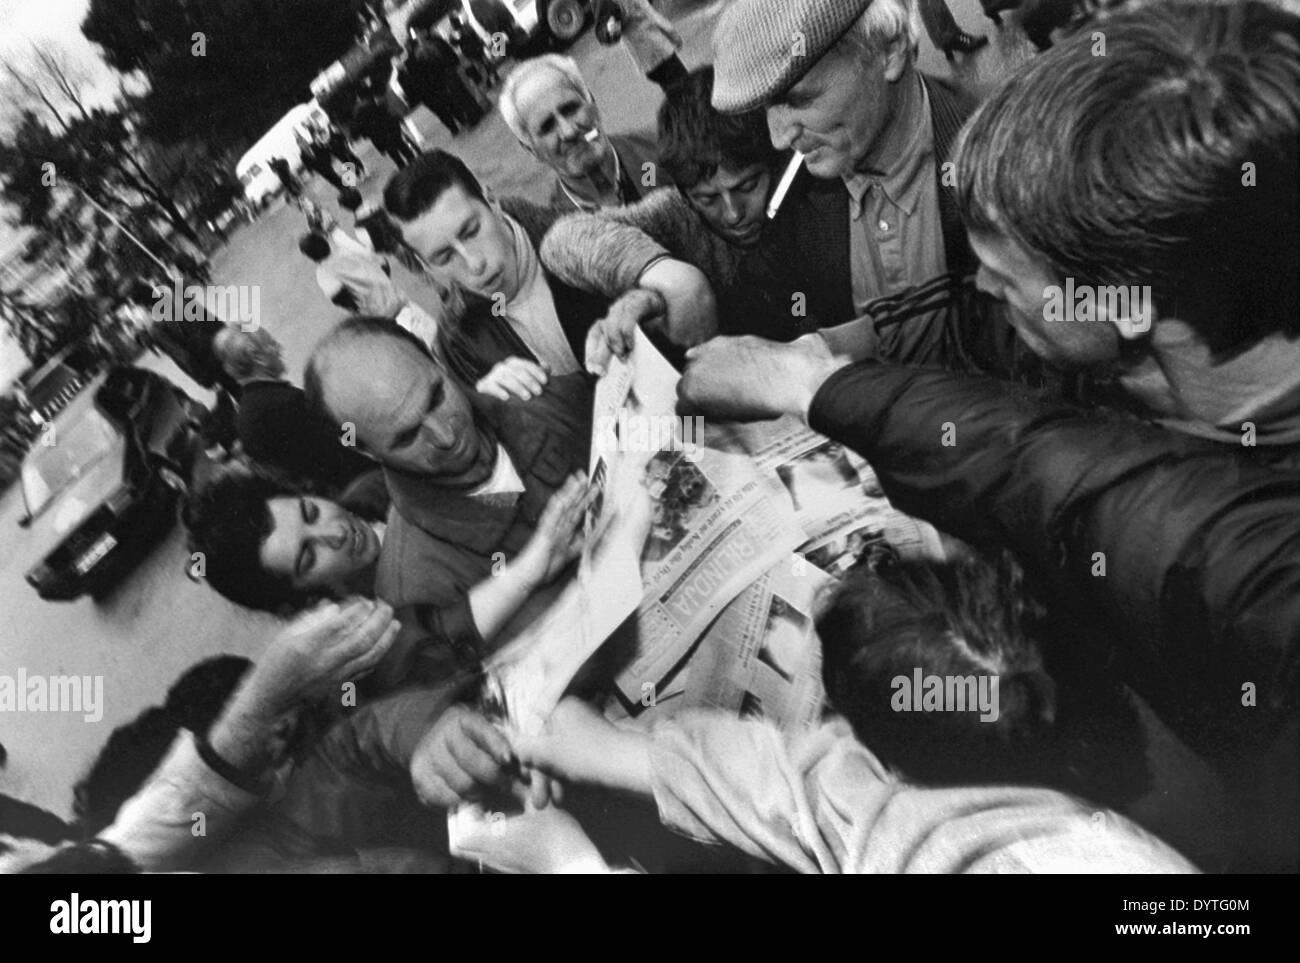 Newspaper distribution to Kosovo refugees - Stock Image